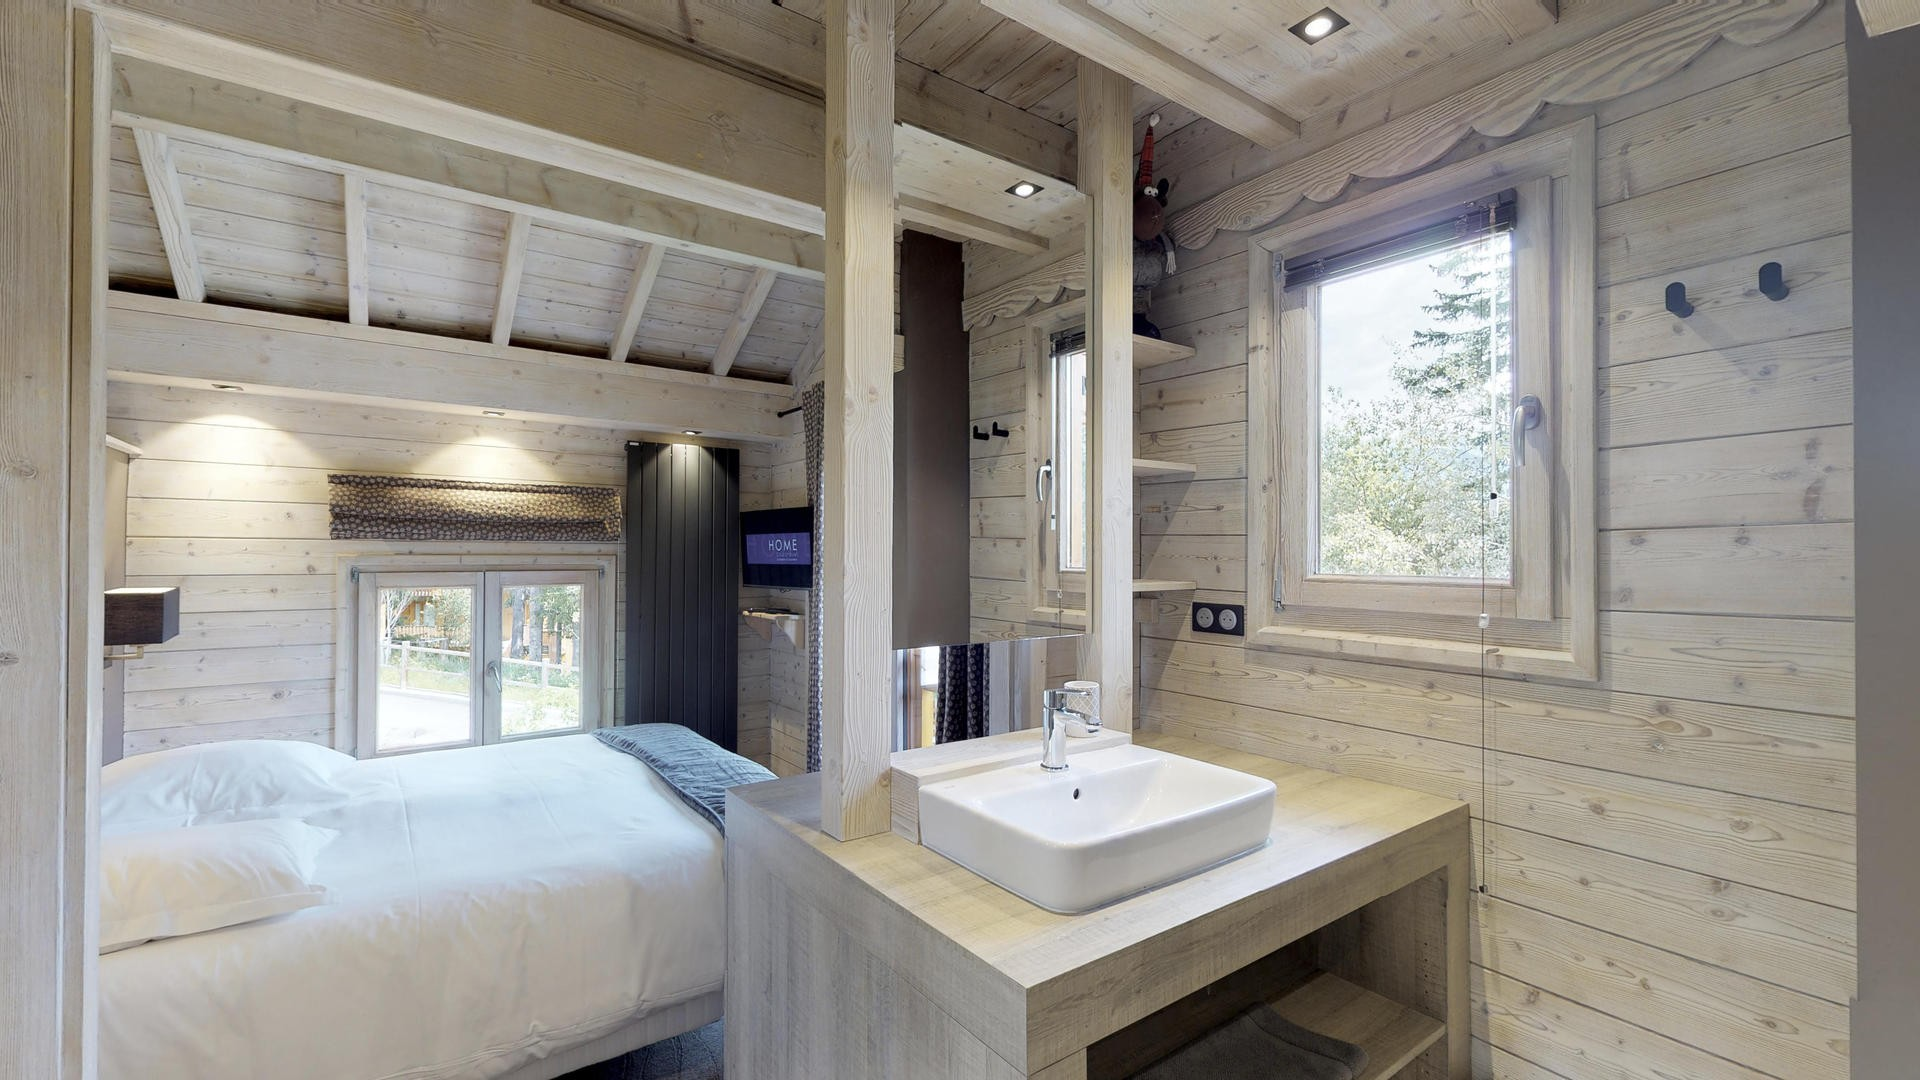 la-tania-location-chalet-luxe-coukite